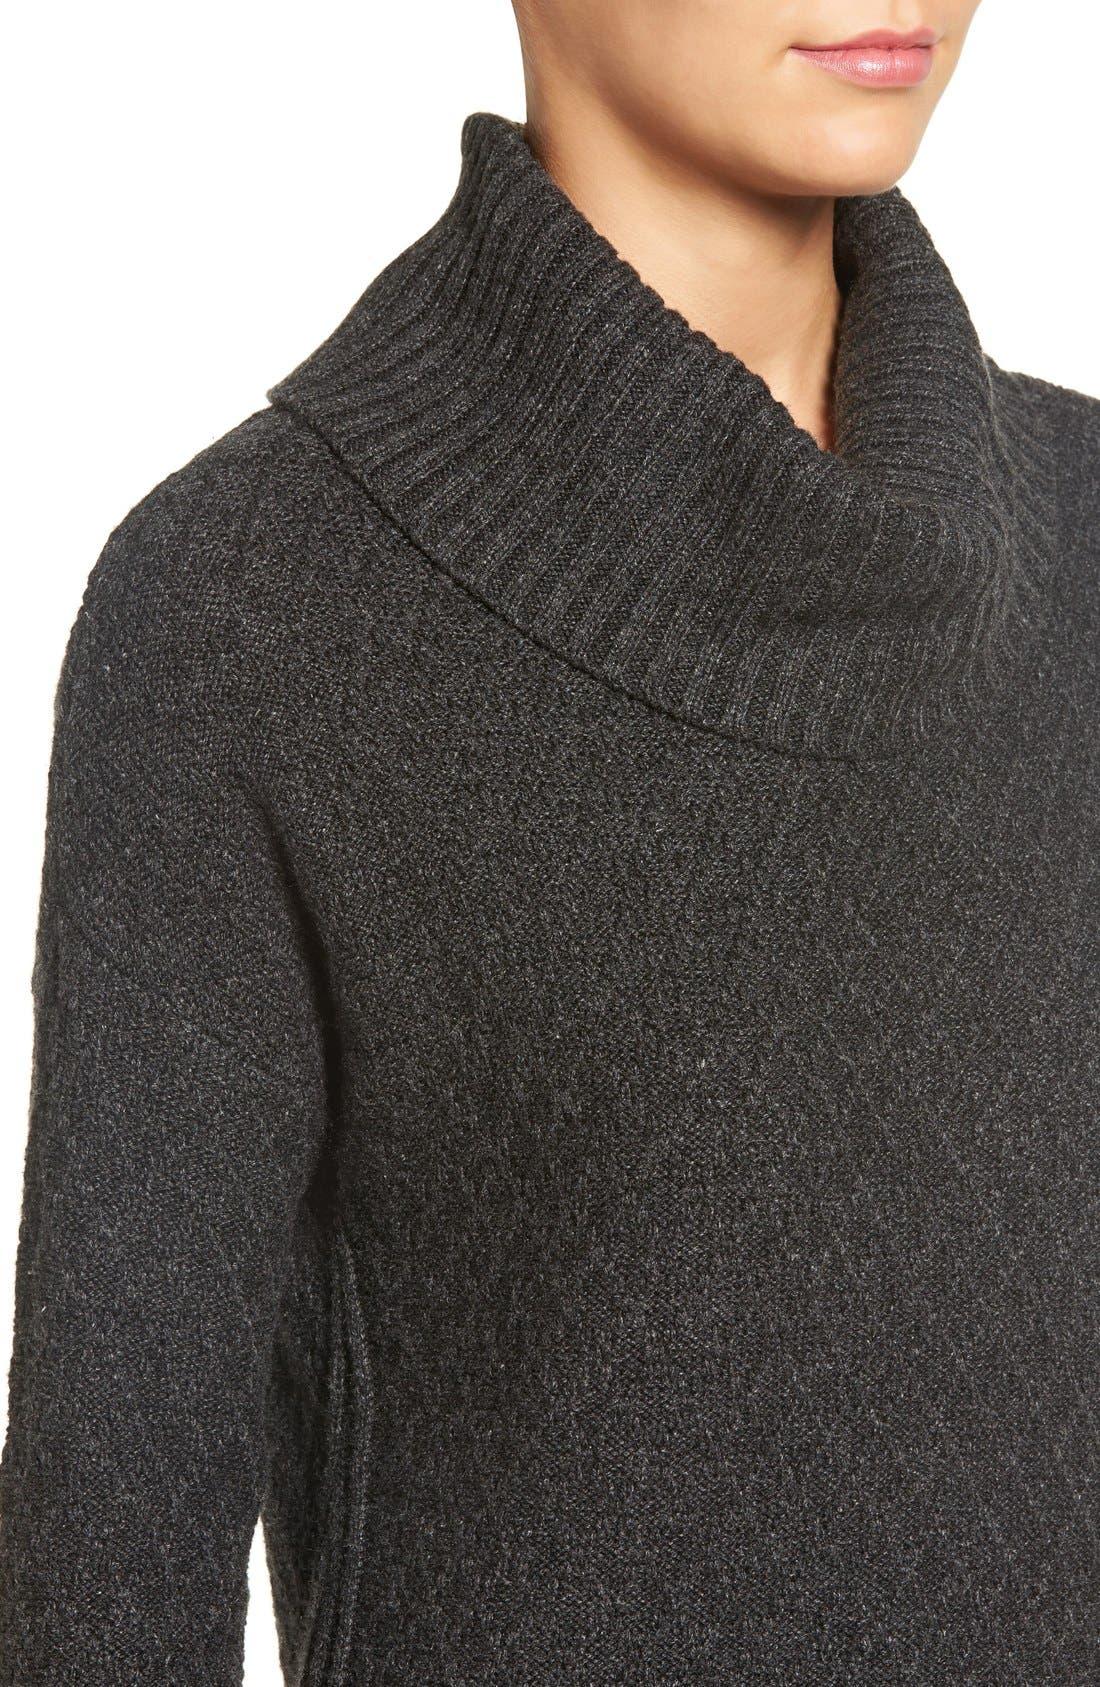 Alternate Image 4  - Treasure&Bond Turtleneck Sweater Dress